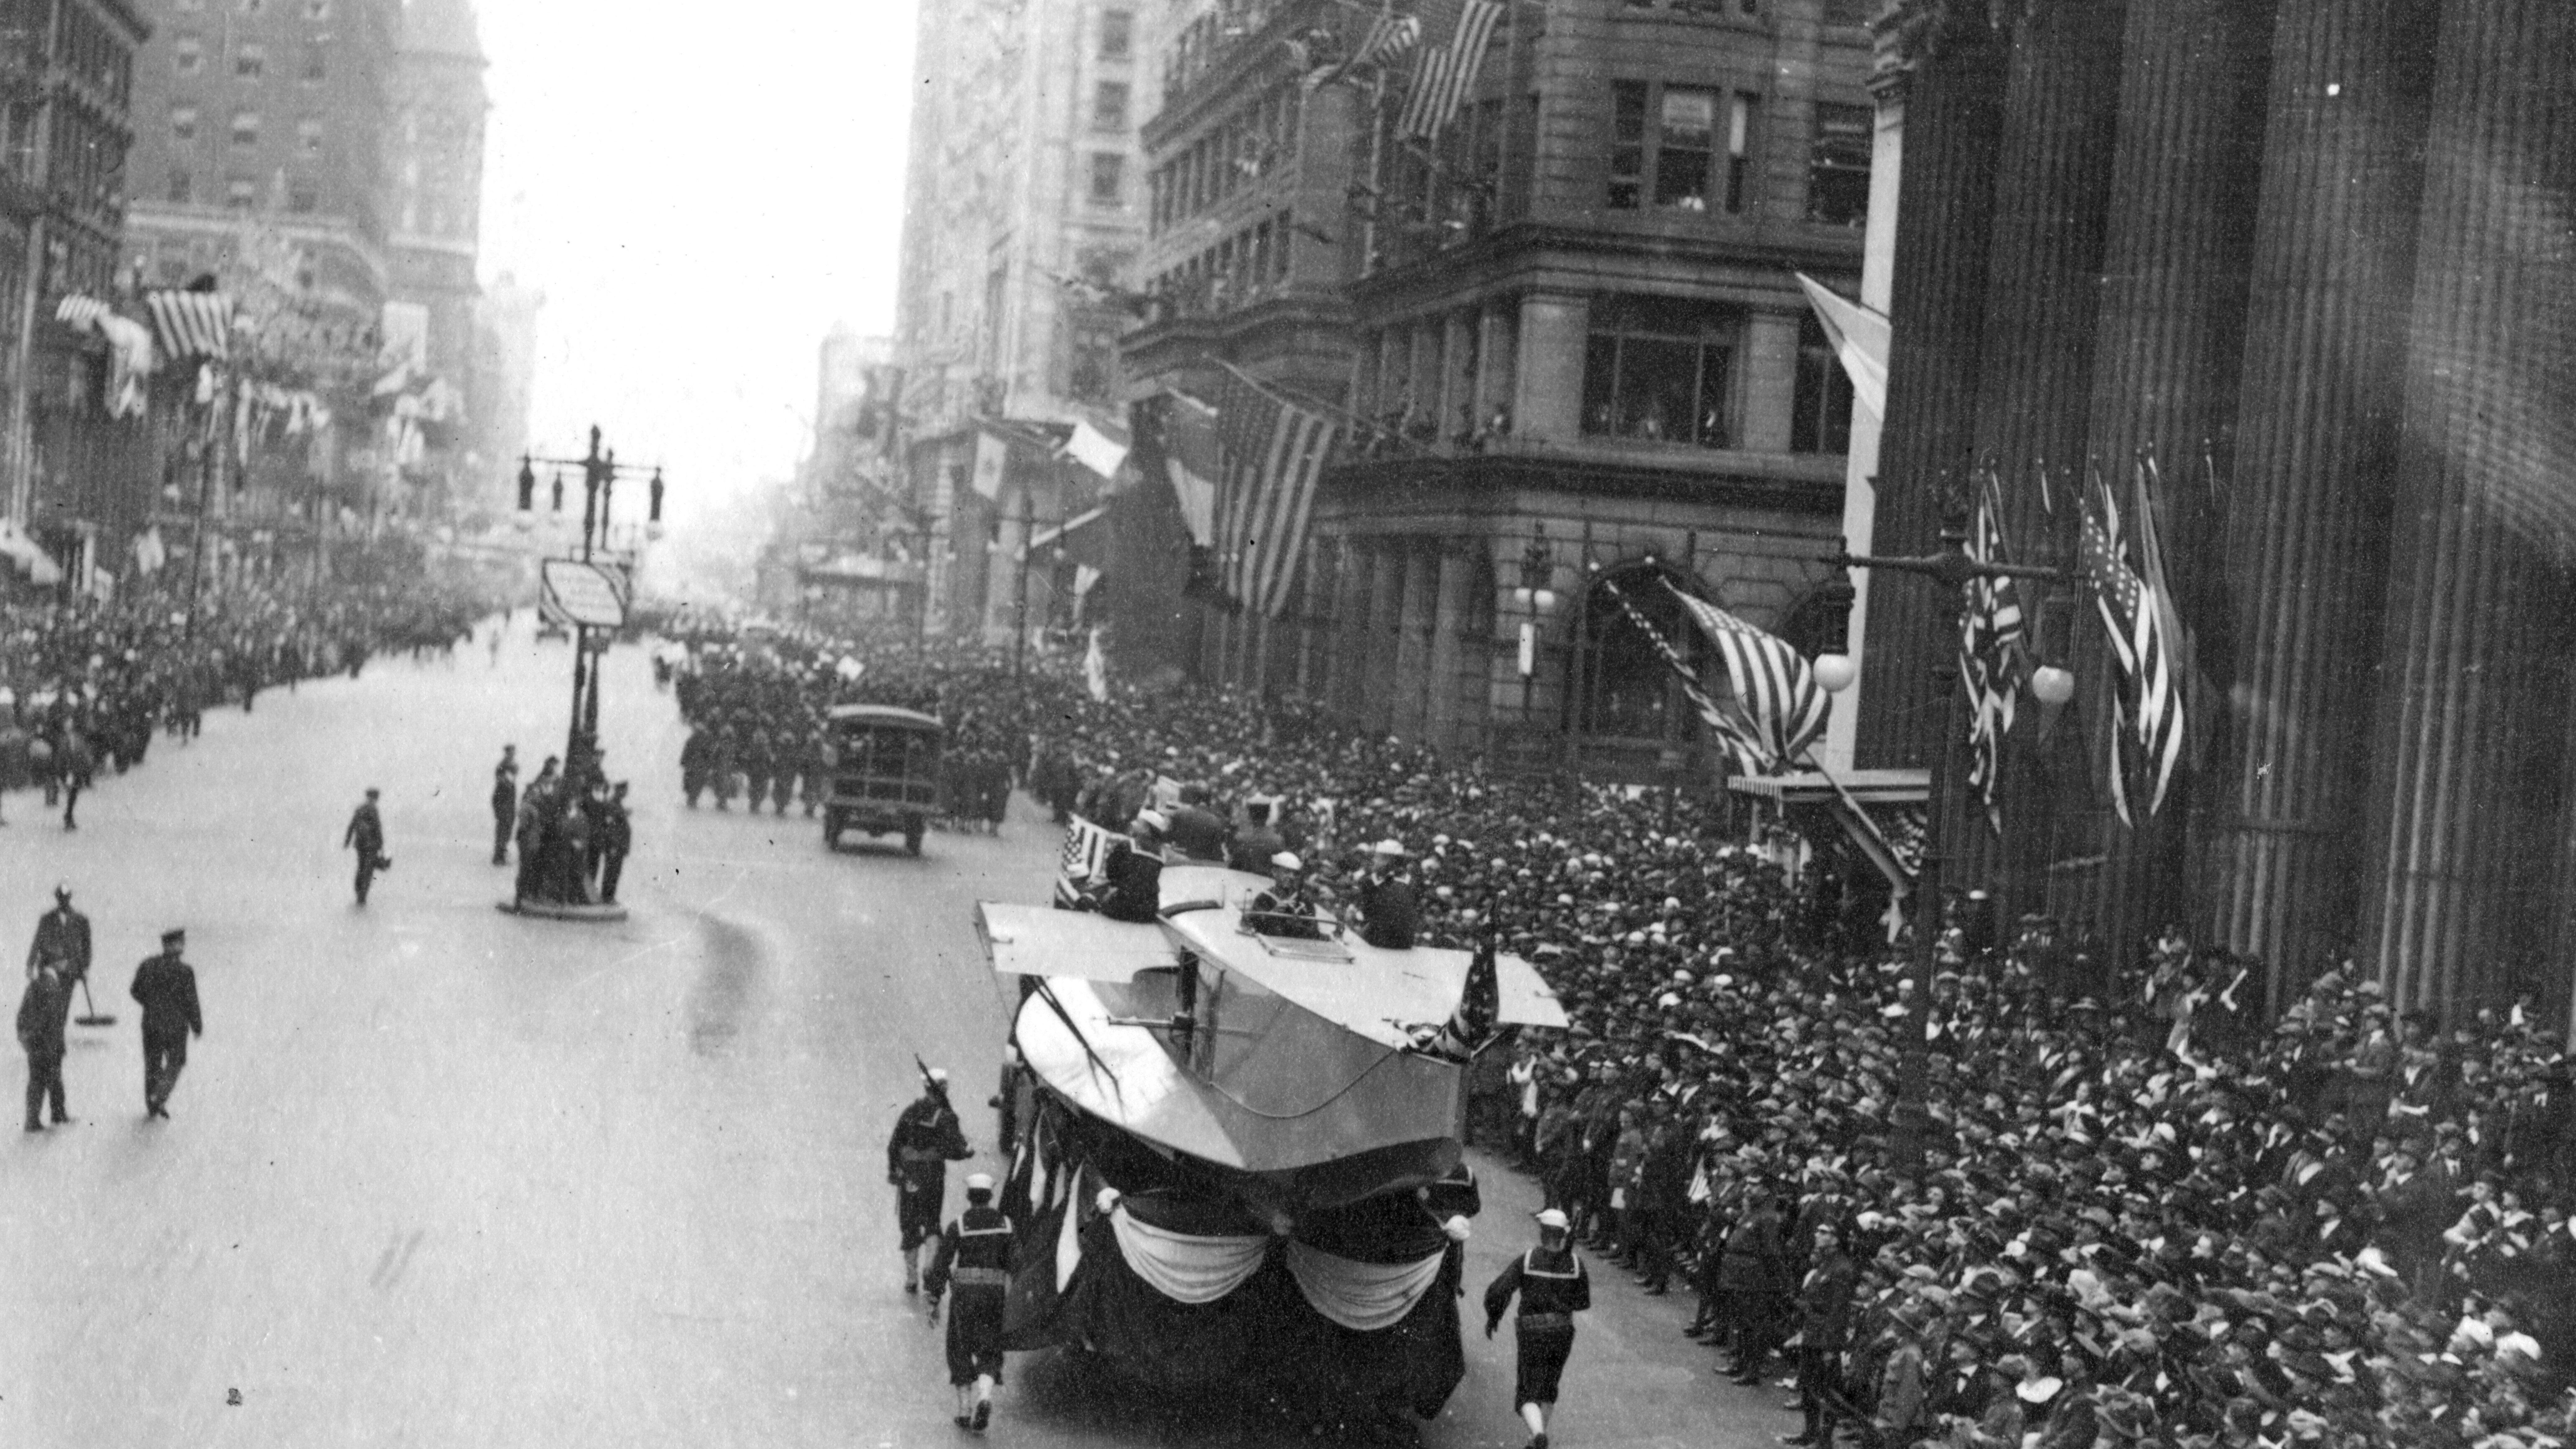 1918 parade spread flu pandemic